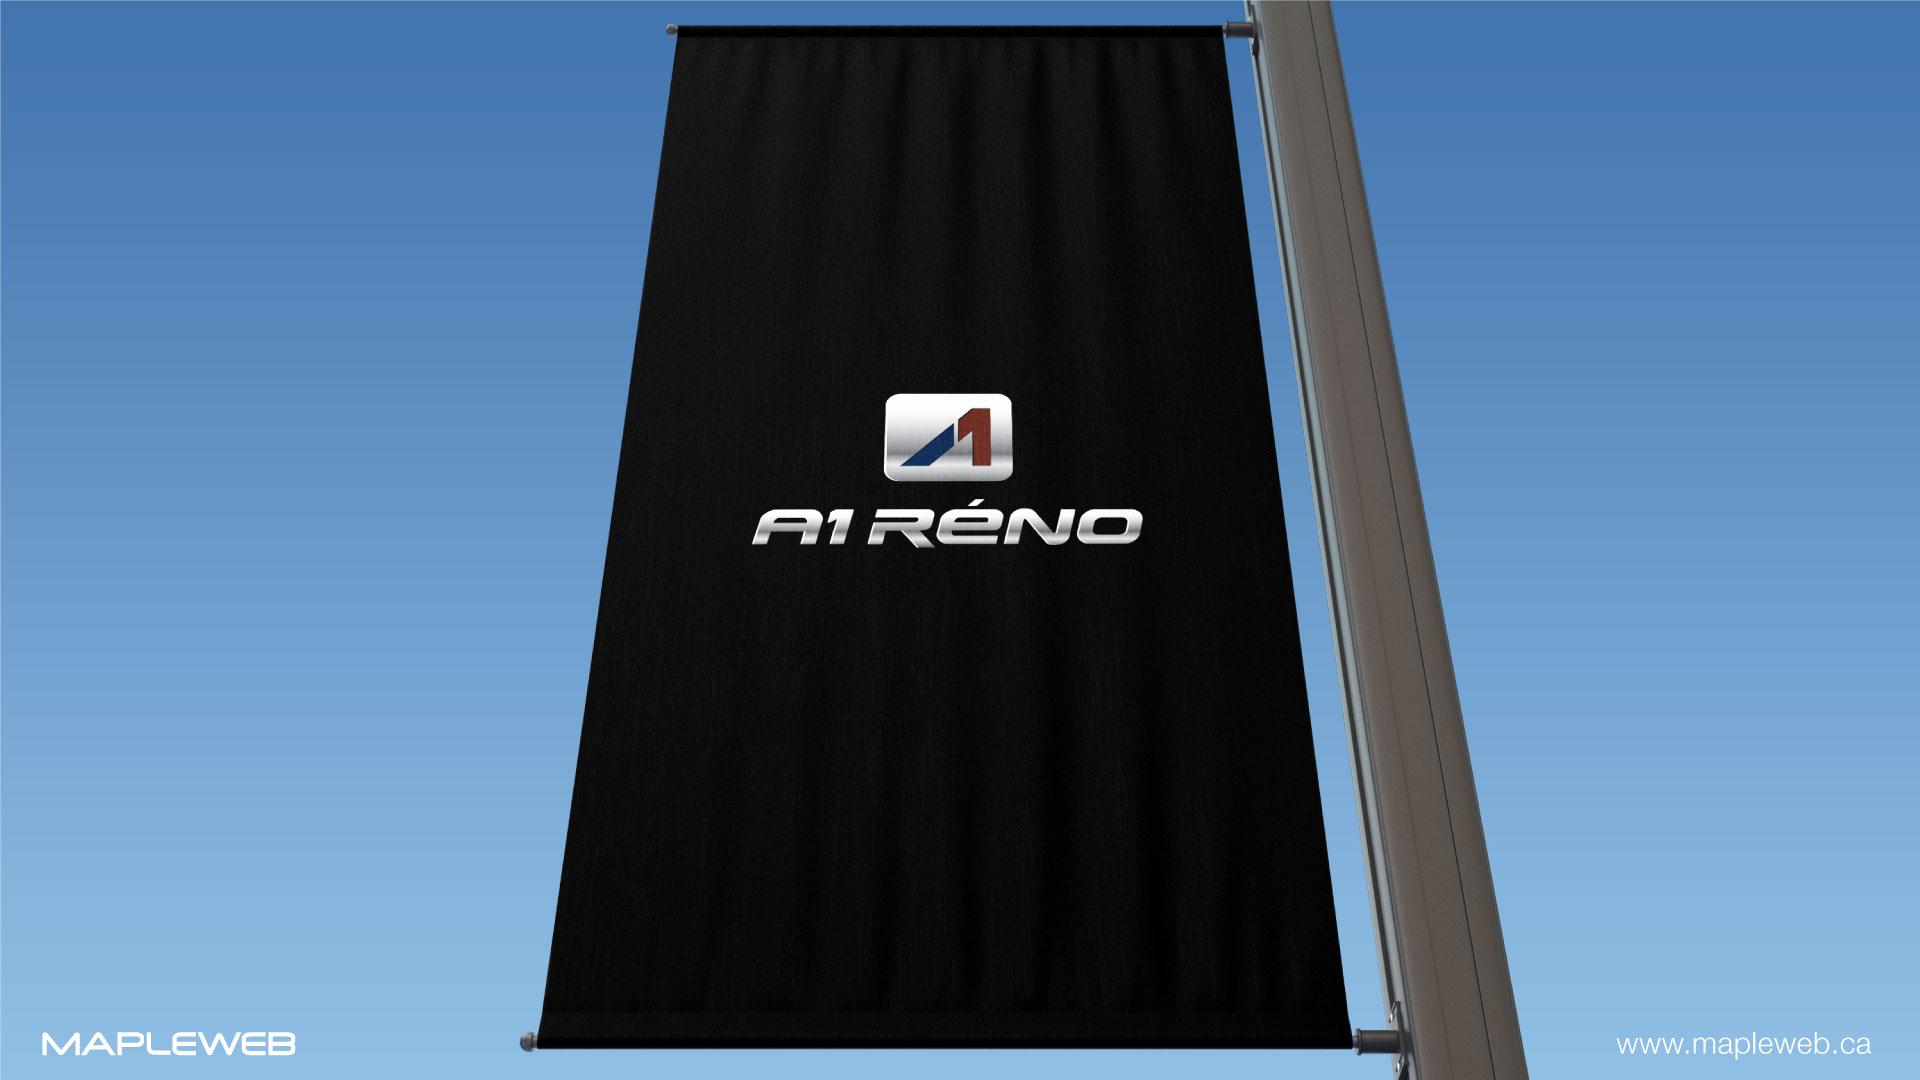 a1-reno-brand-logo-design-by-mapleweb-vancouver-canada-logo-on-black-banner-mock